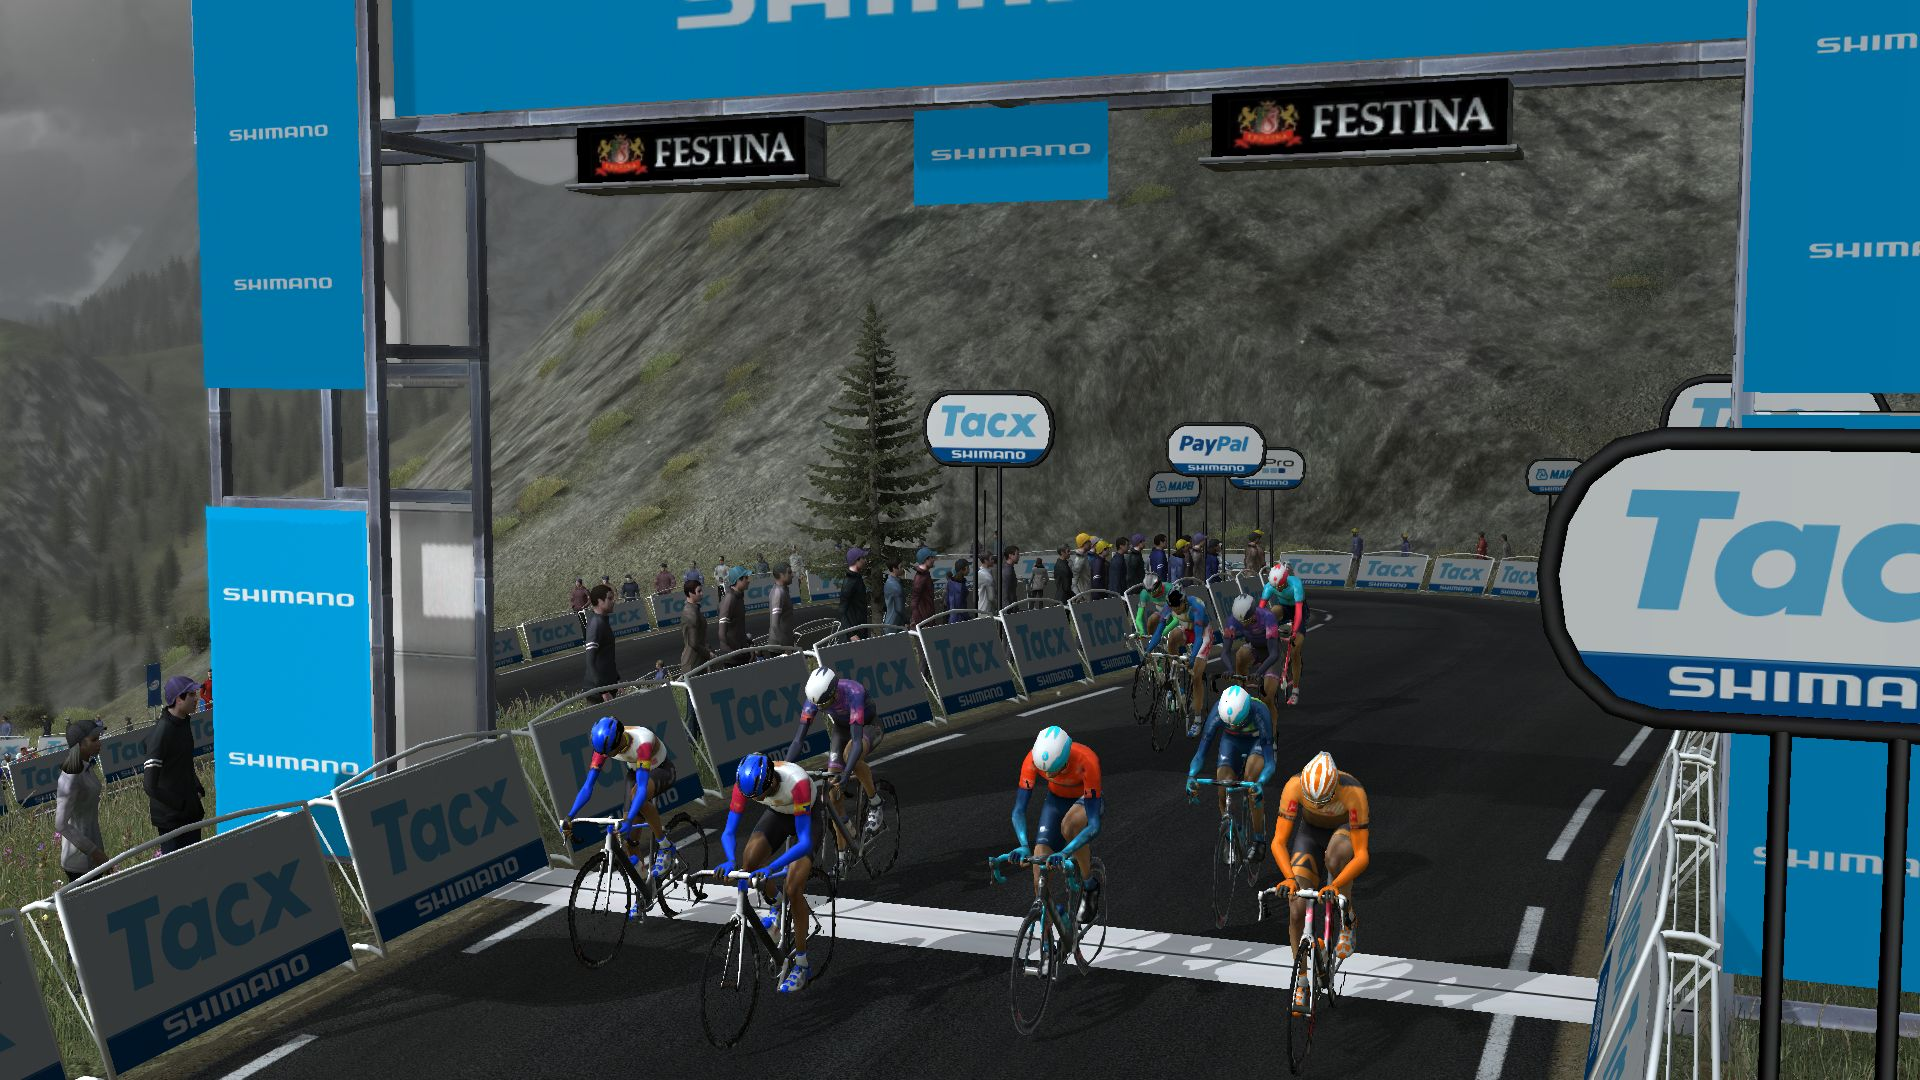 pcmdaily.com/images/mg/2017/Races/CT/Trentino/mg2017_trentino_05_PCM0094.jpg